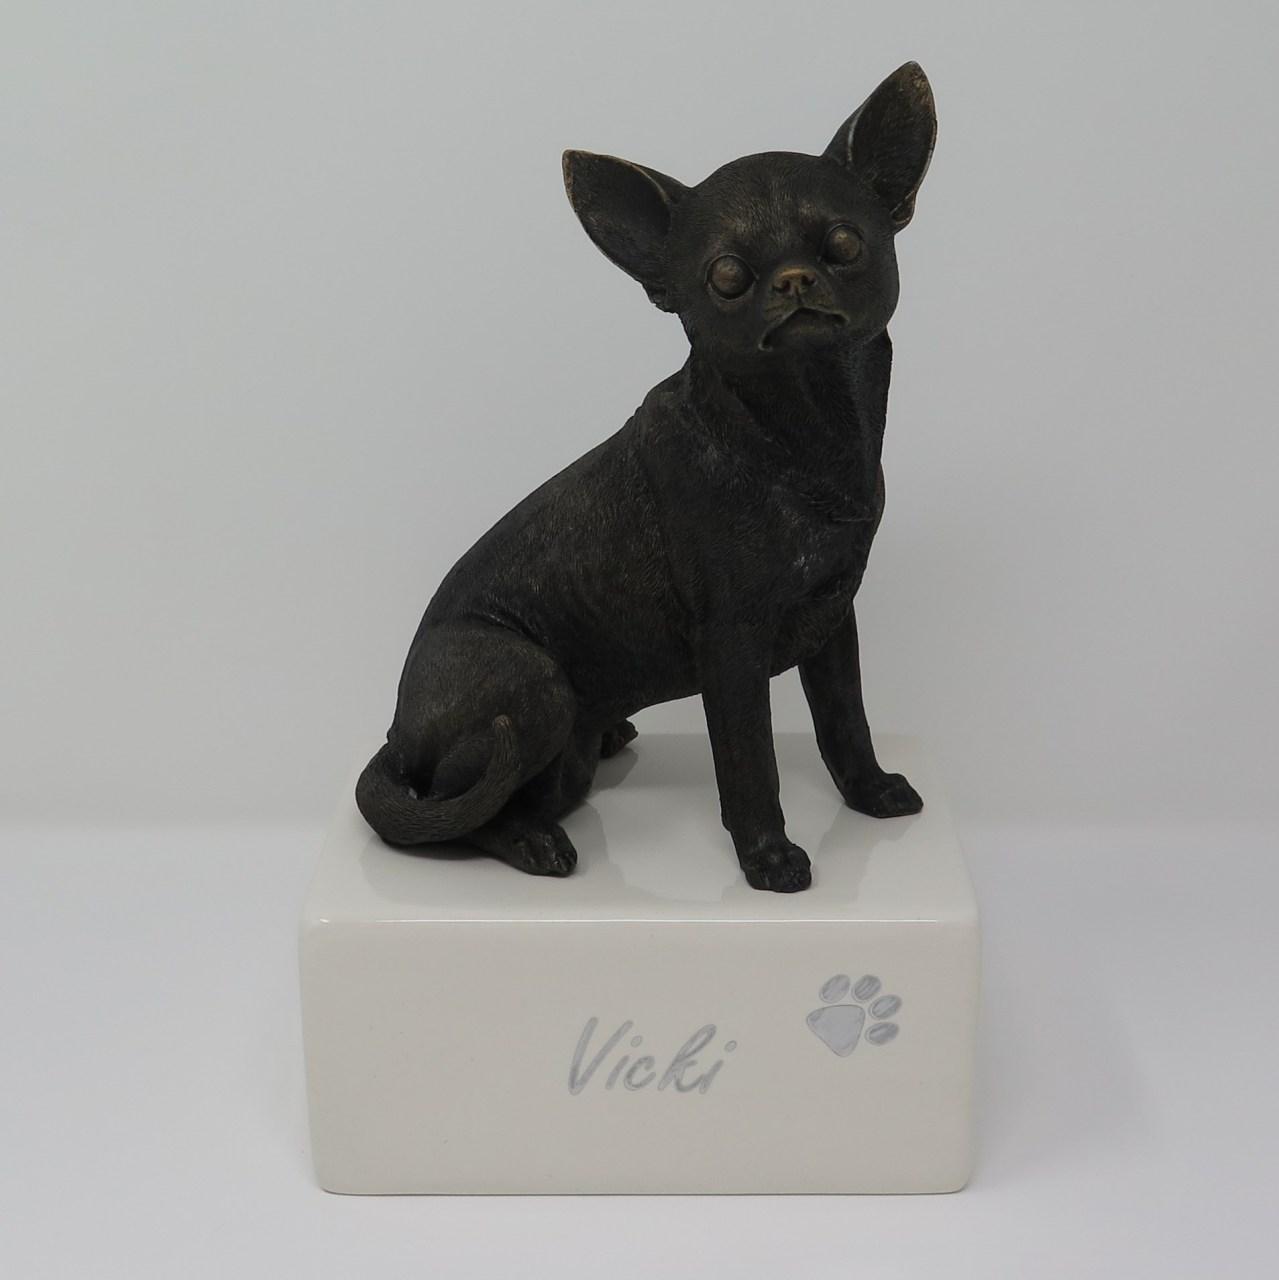 Chihuahua Urne Designurne mit großer Figur